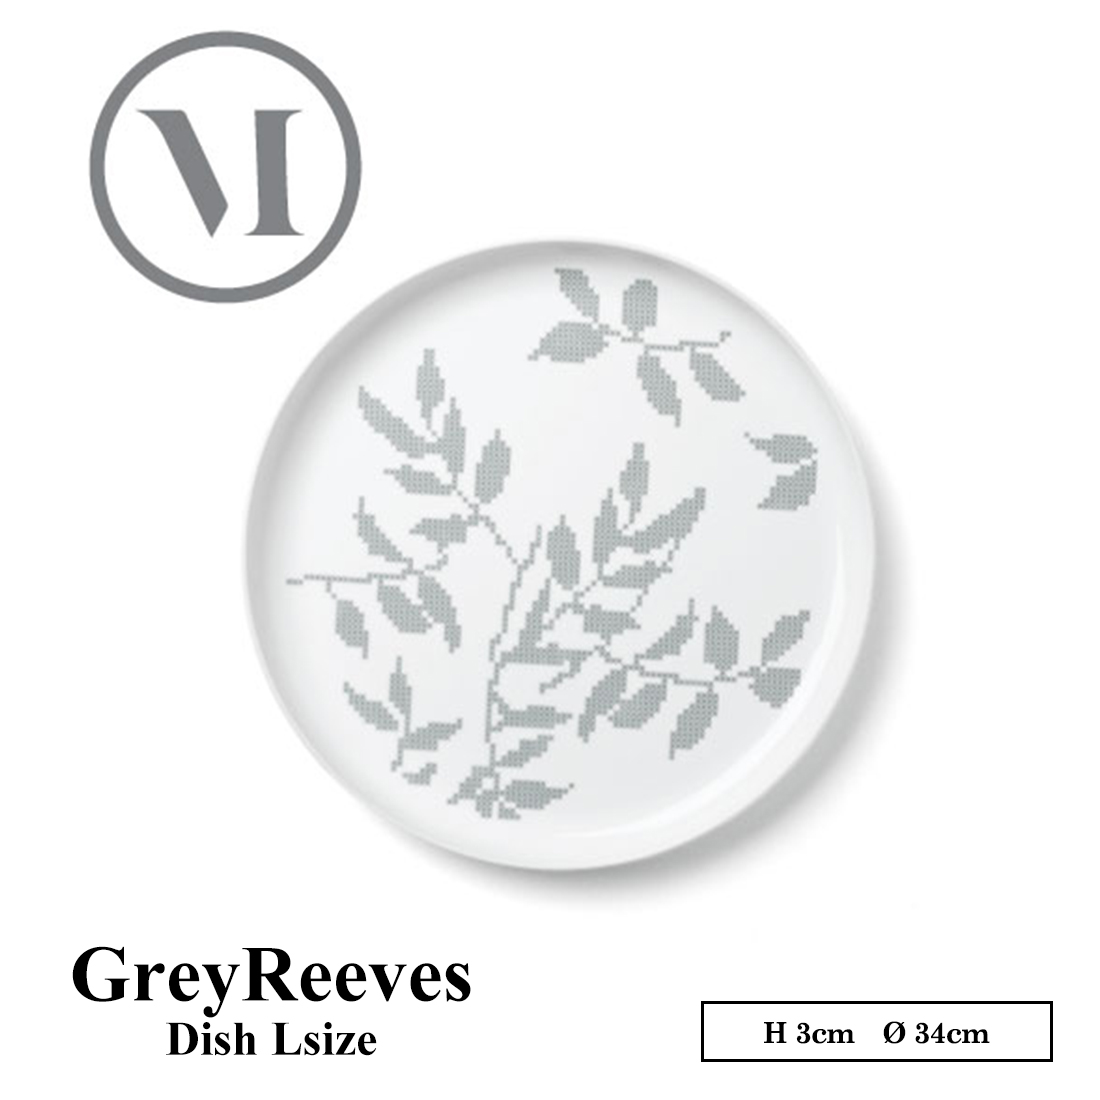 【menu】グレイリーブス ディッシュLサイズ 4595050 MENU Dish 丸皿 コンビニ受取対応